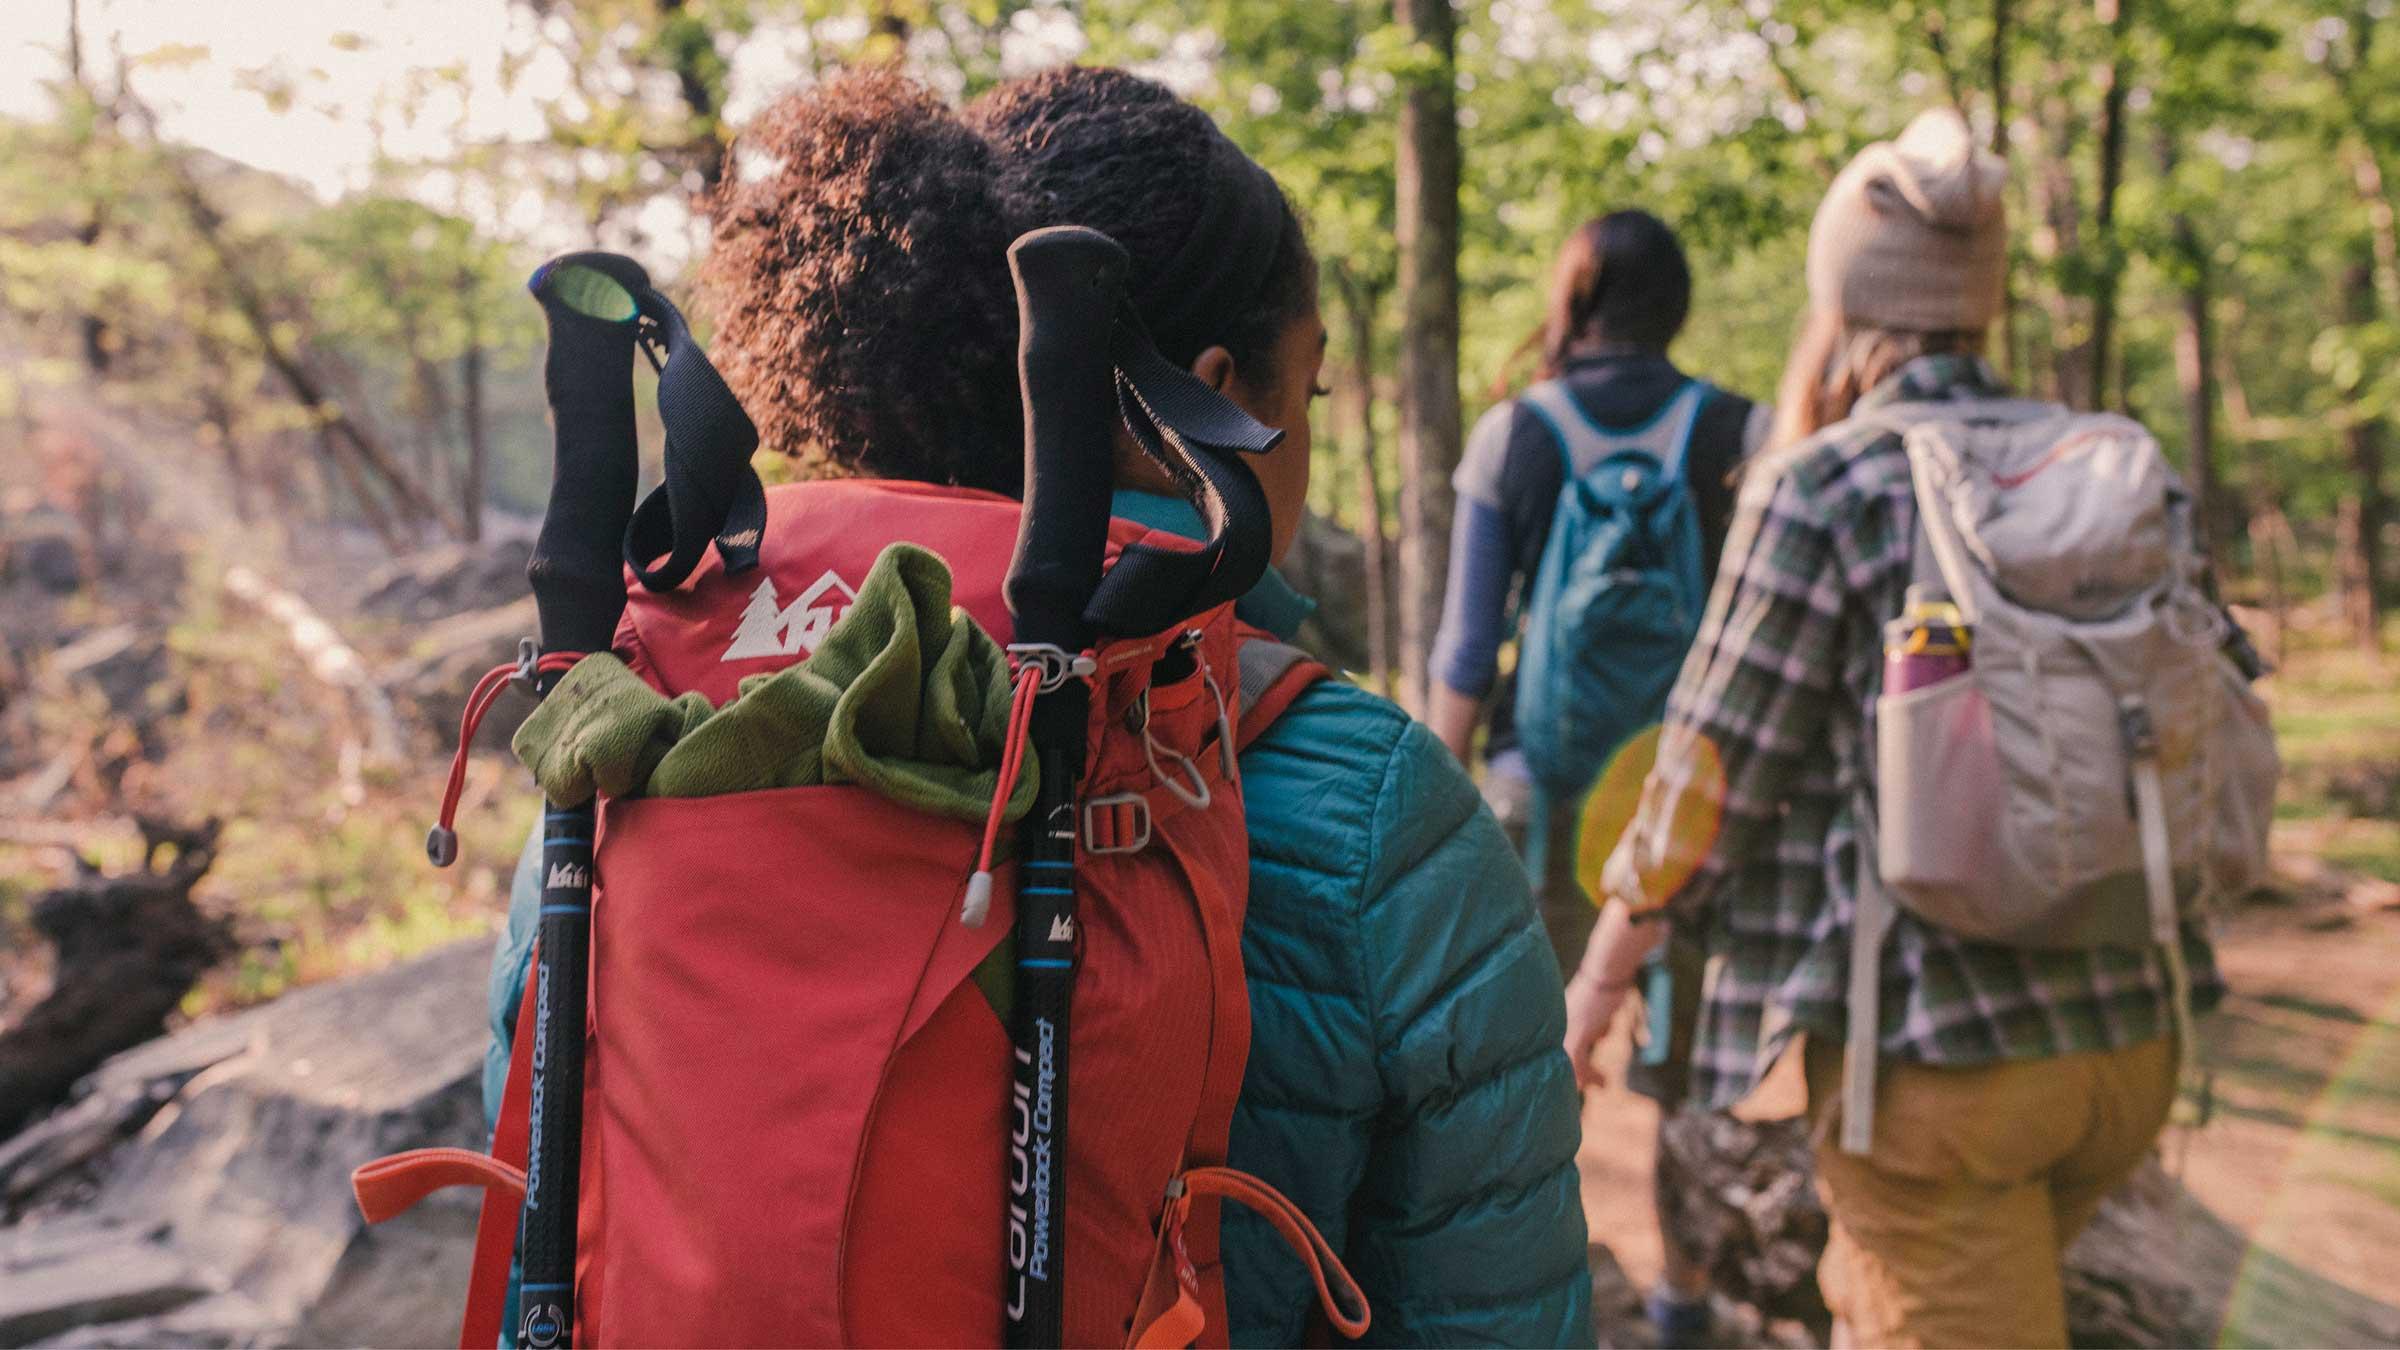 Study: Hiking Makes You Happier